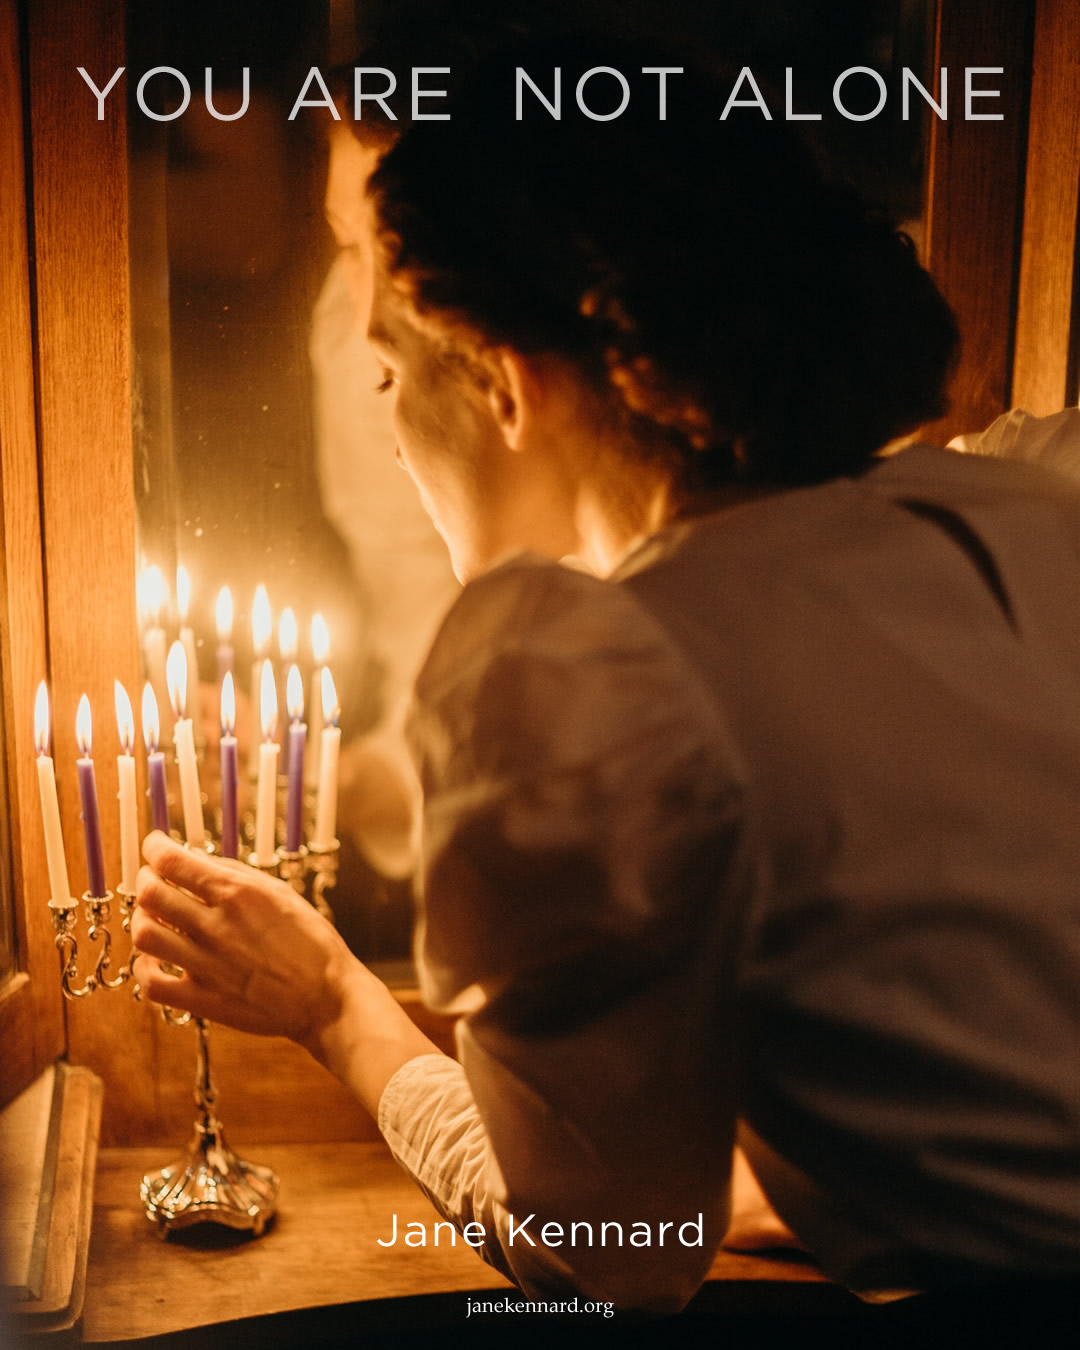 The-Holidays-with-Jane-Kennard-Hanukkah-2020-photo-pexels-cottonbro